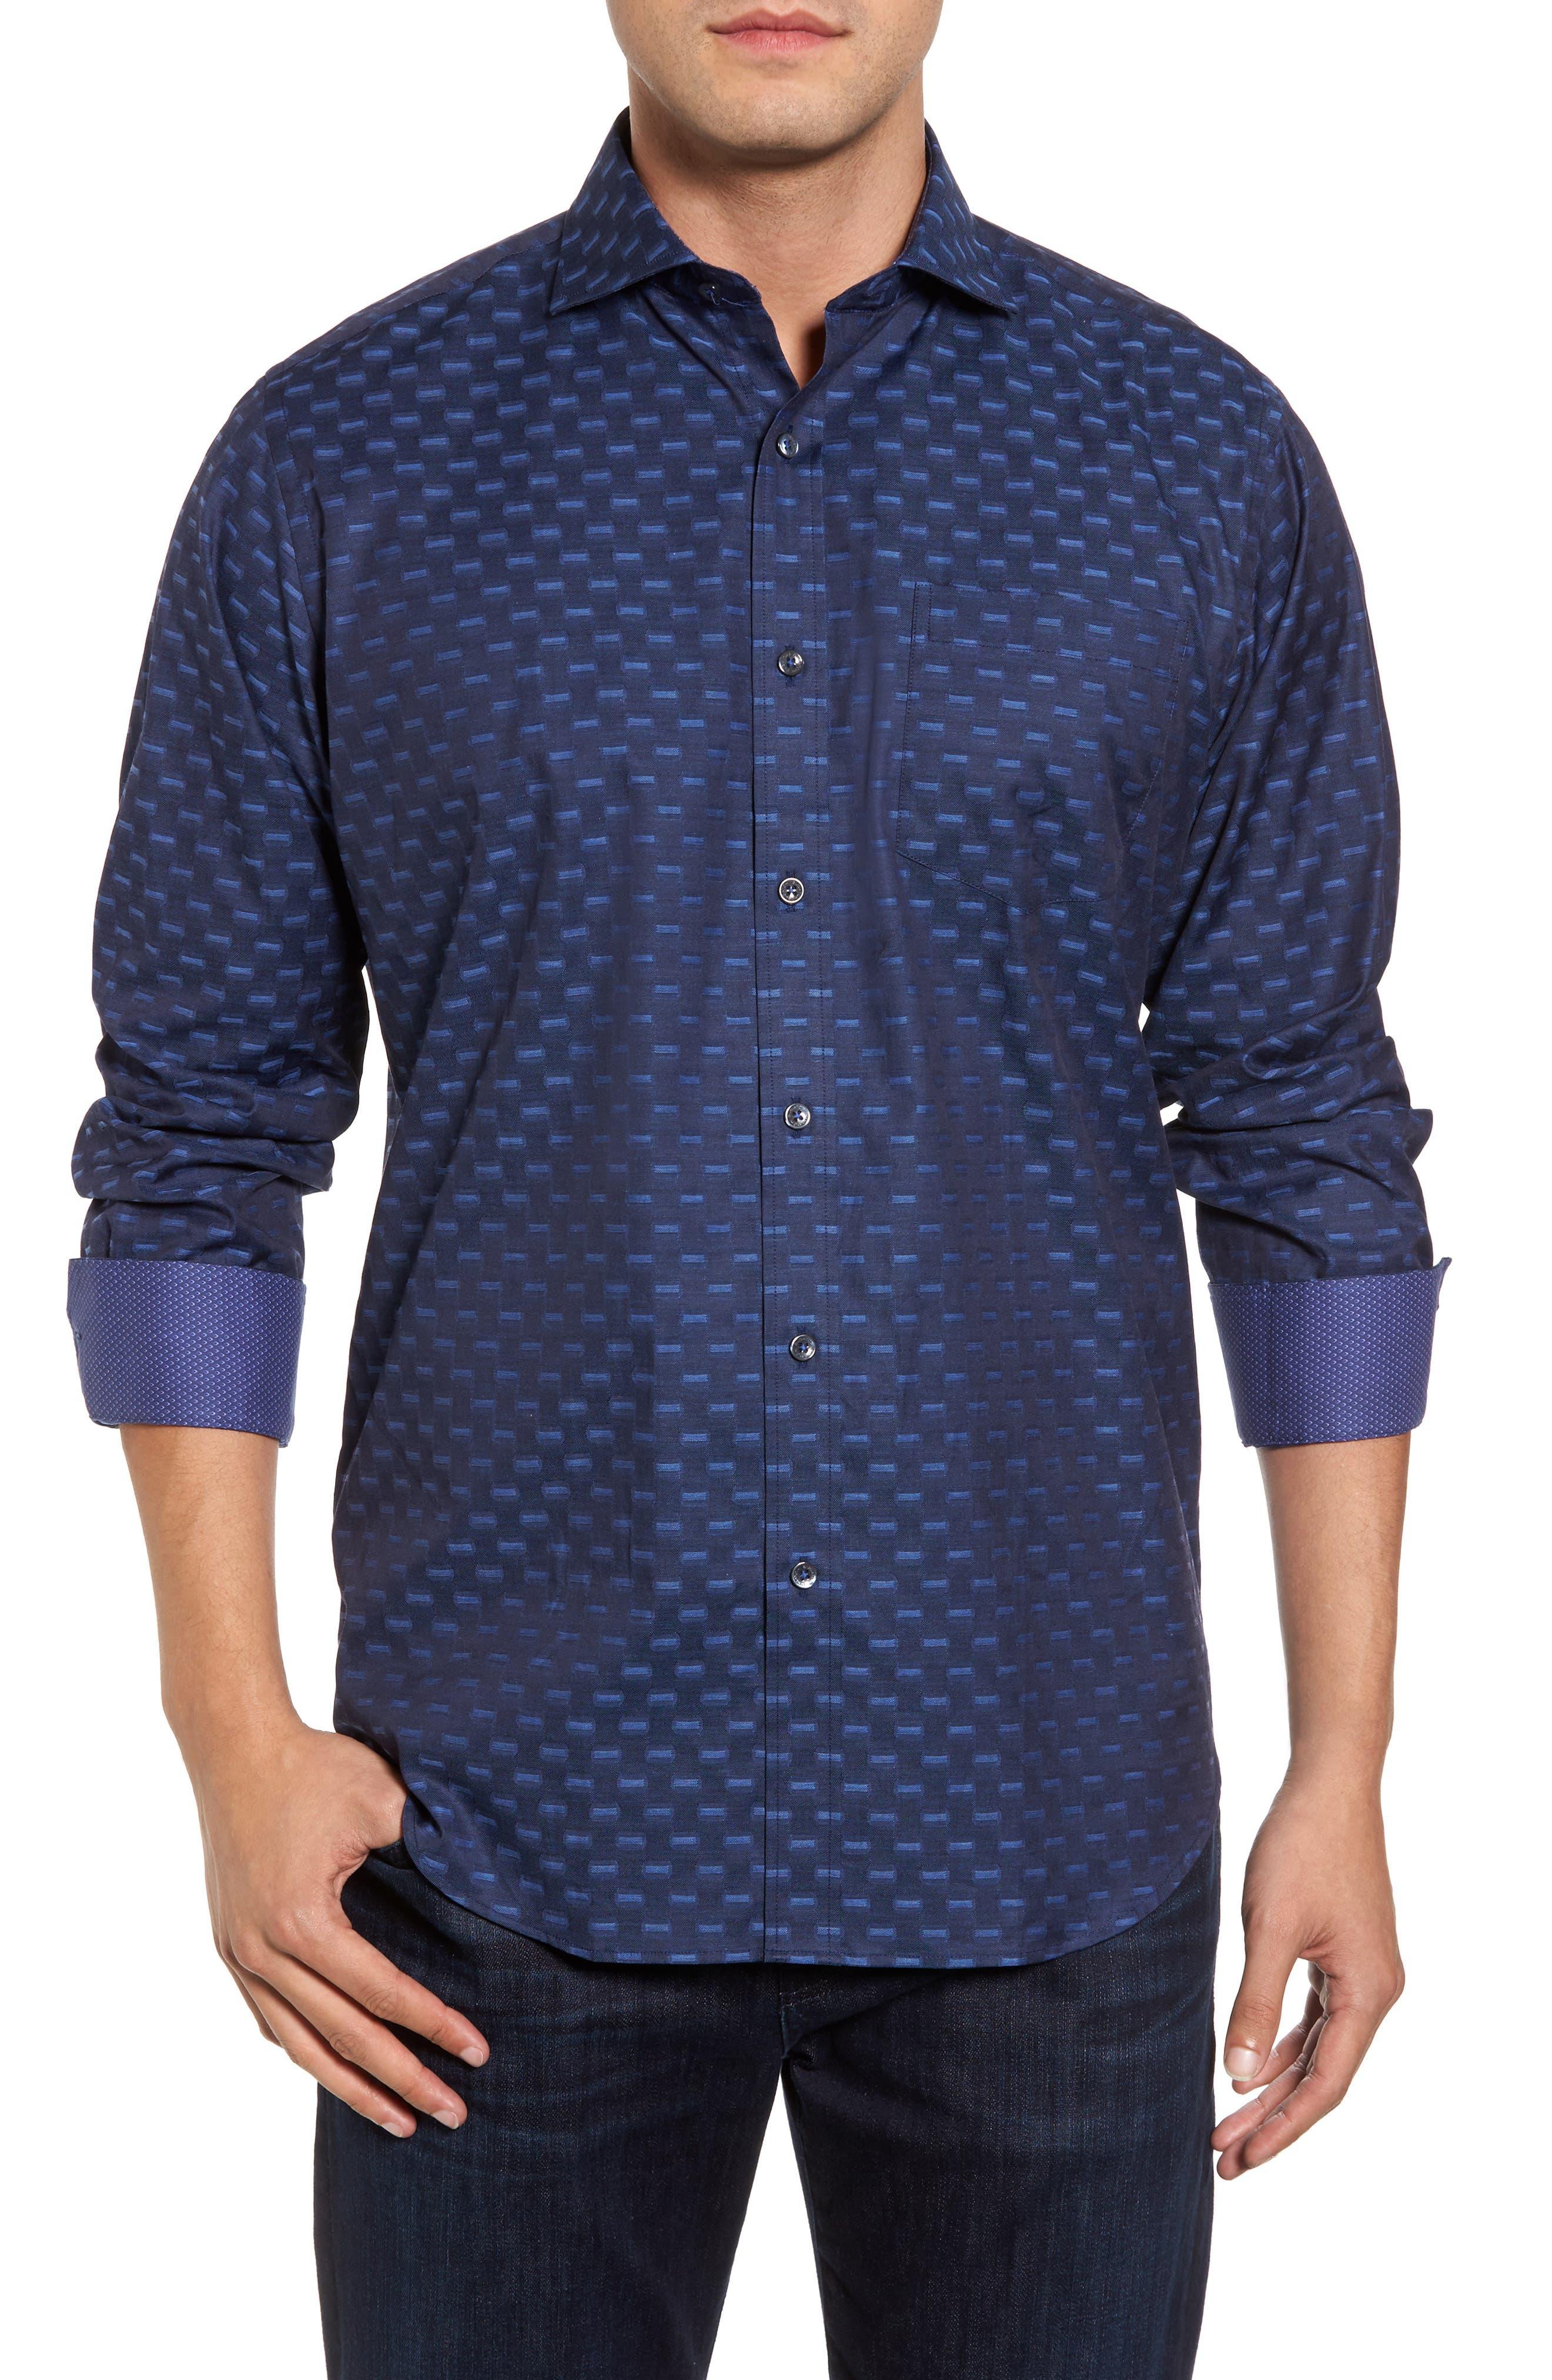 Alternate Image 1 Selected - Bugatchi Classic Fit Jacquard Sport Shirt